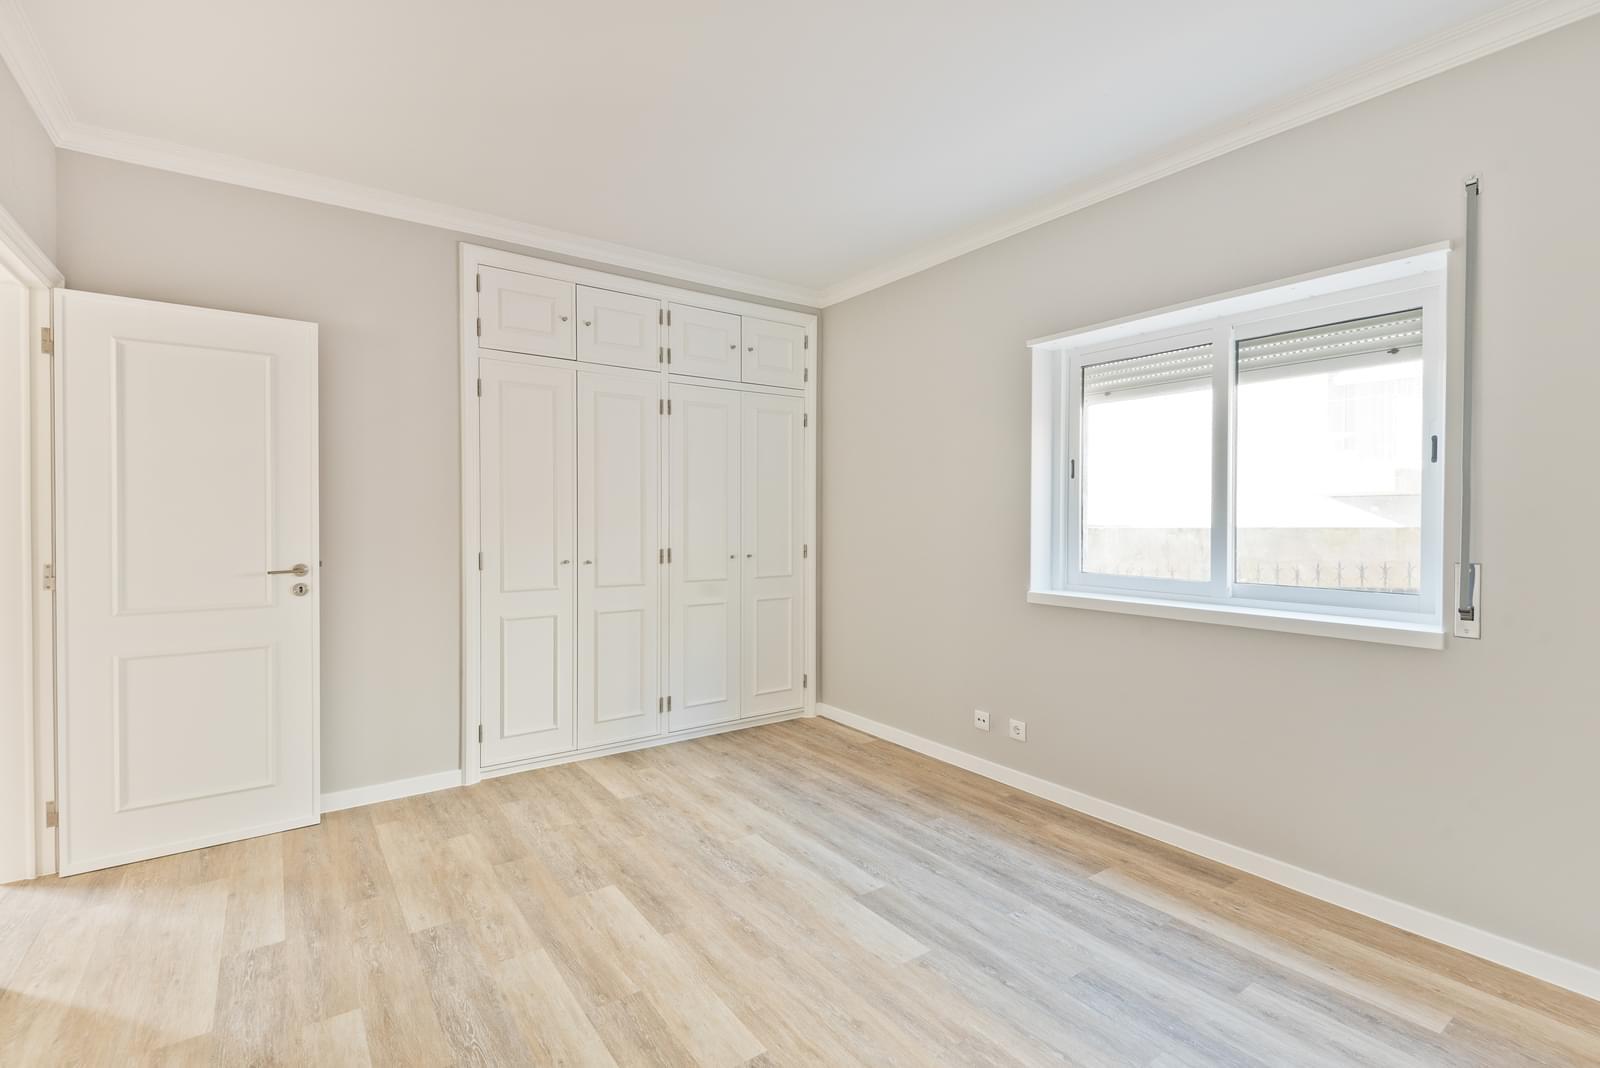 pf18908-apartamento-t2-cascais-2cf05773-1586-4f08-91a6-10d9d4b85522